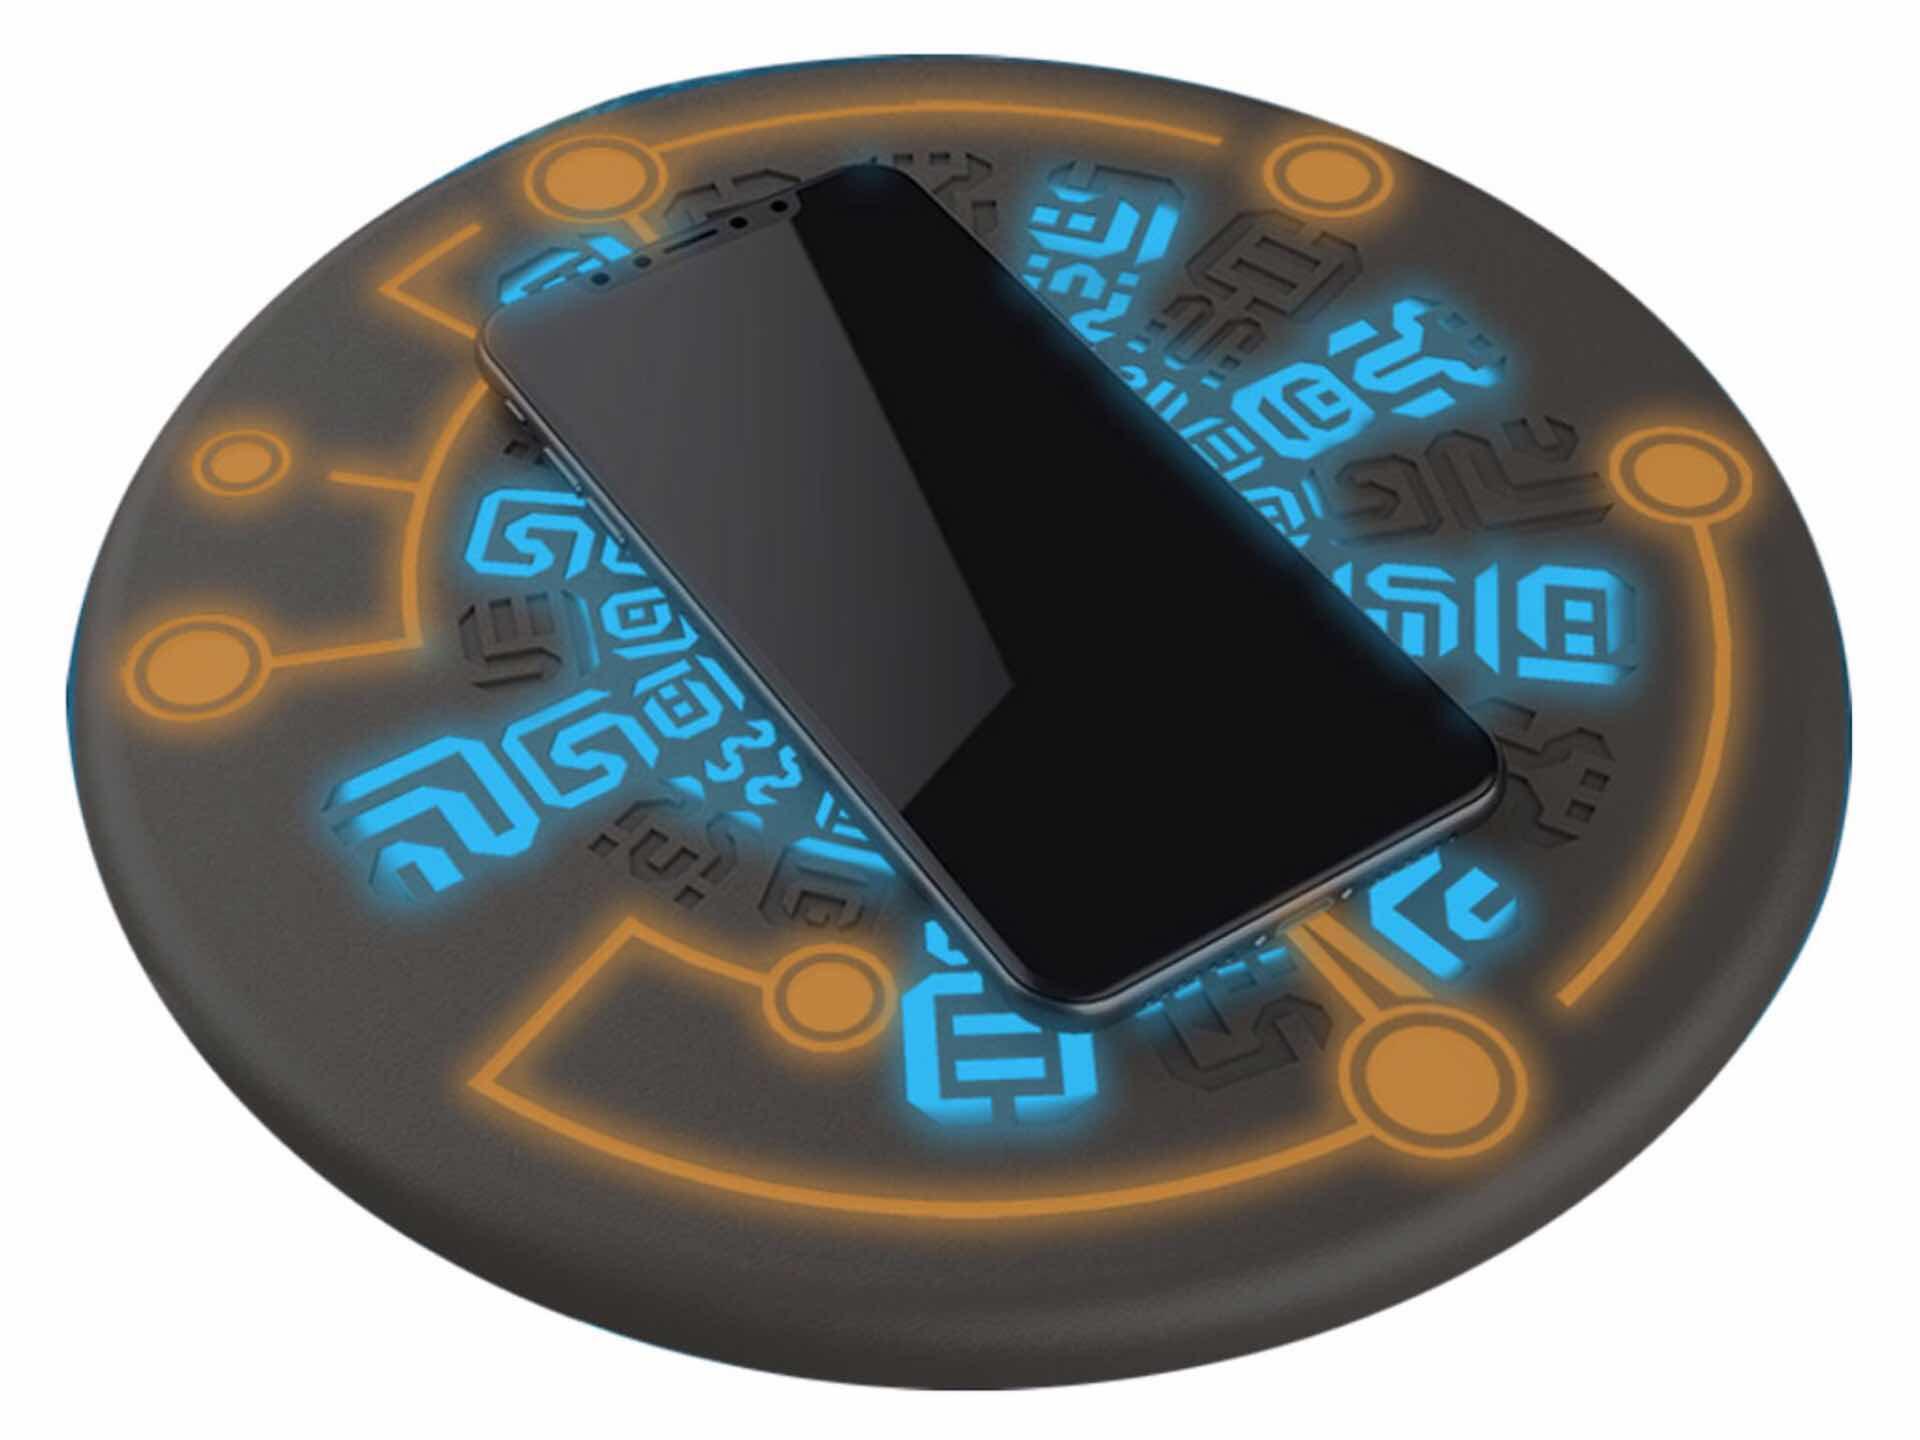 Regisbox Sheikah Slate Zelda Themed Wireless Phone Charging Pad